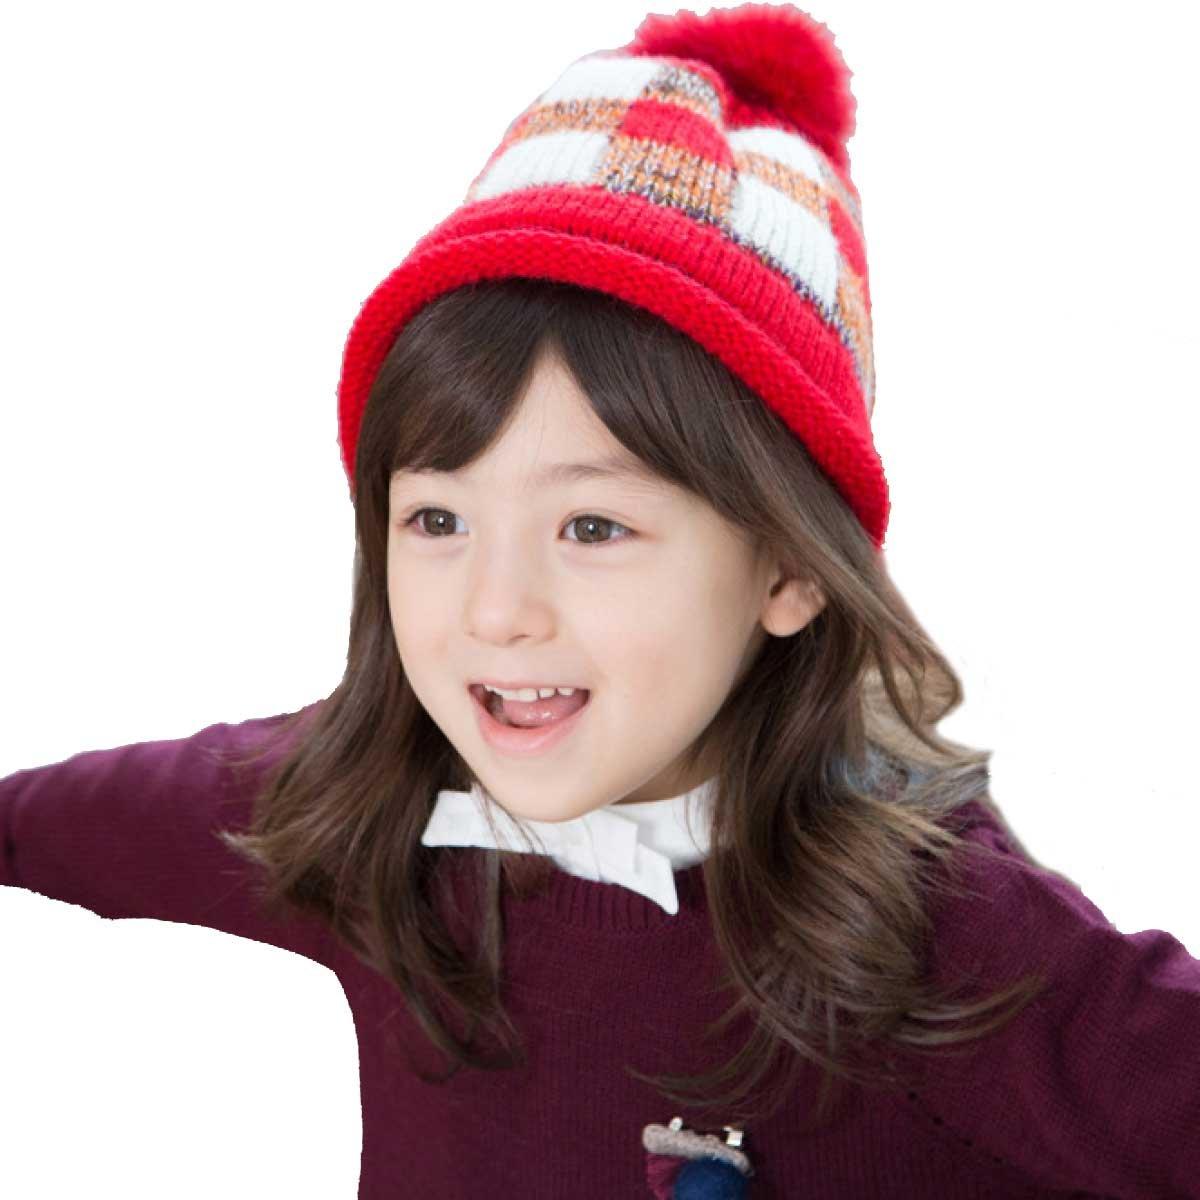 TRIWONDER Winter Hats for Kids Beanie Knit Cap Pom Pom Hat Wool Ski Cap OS2403PI